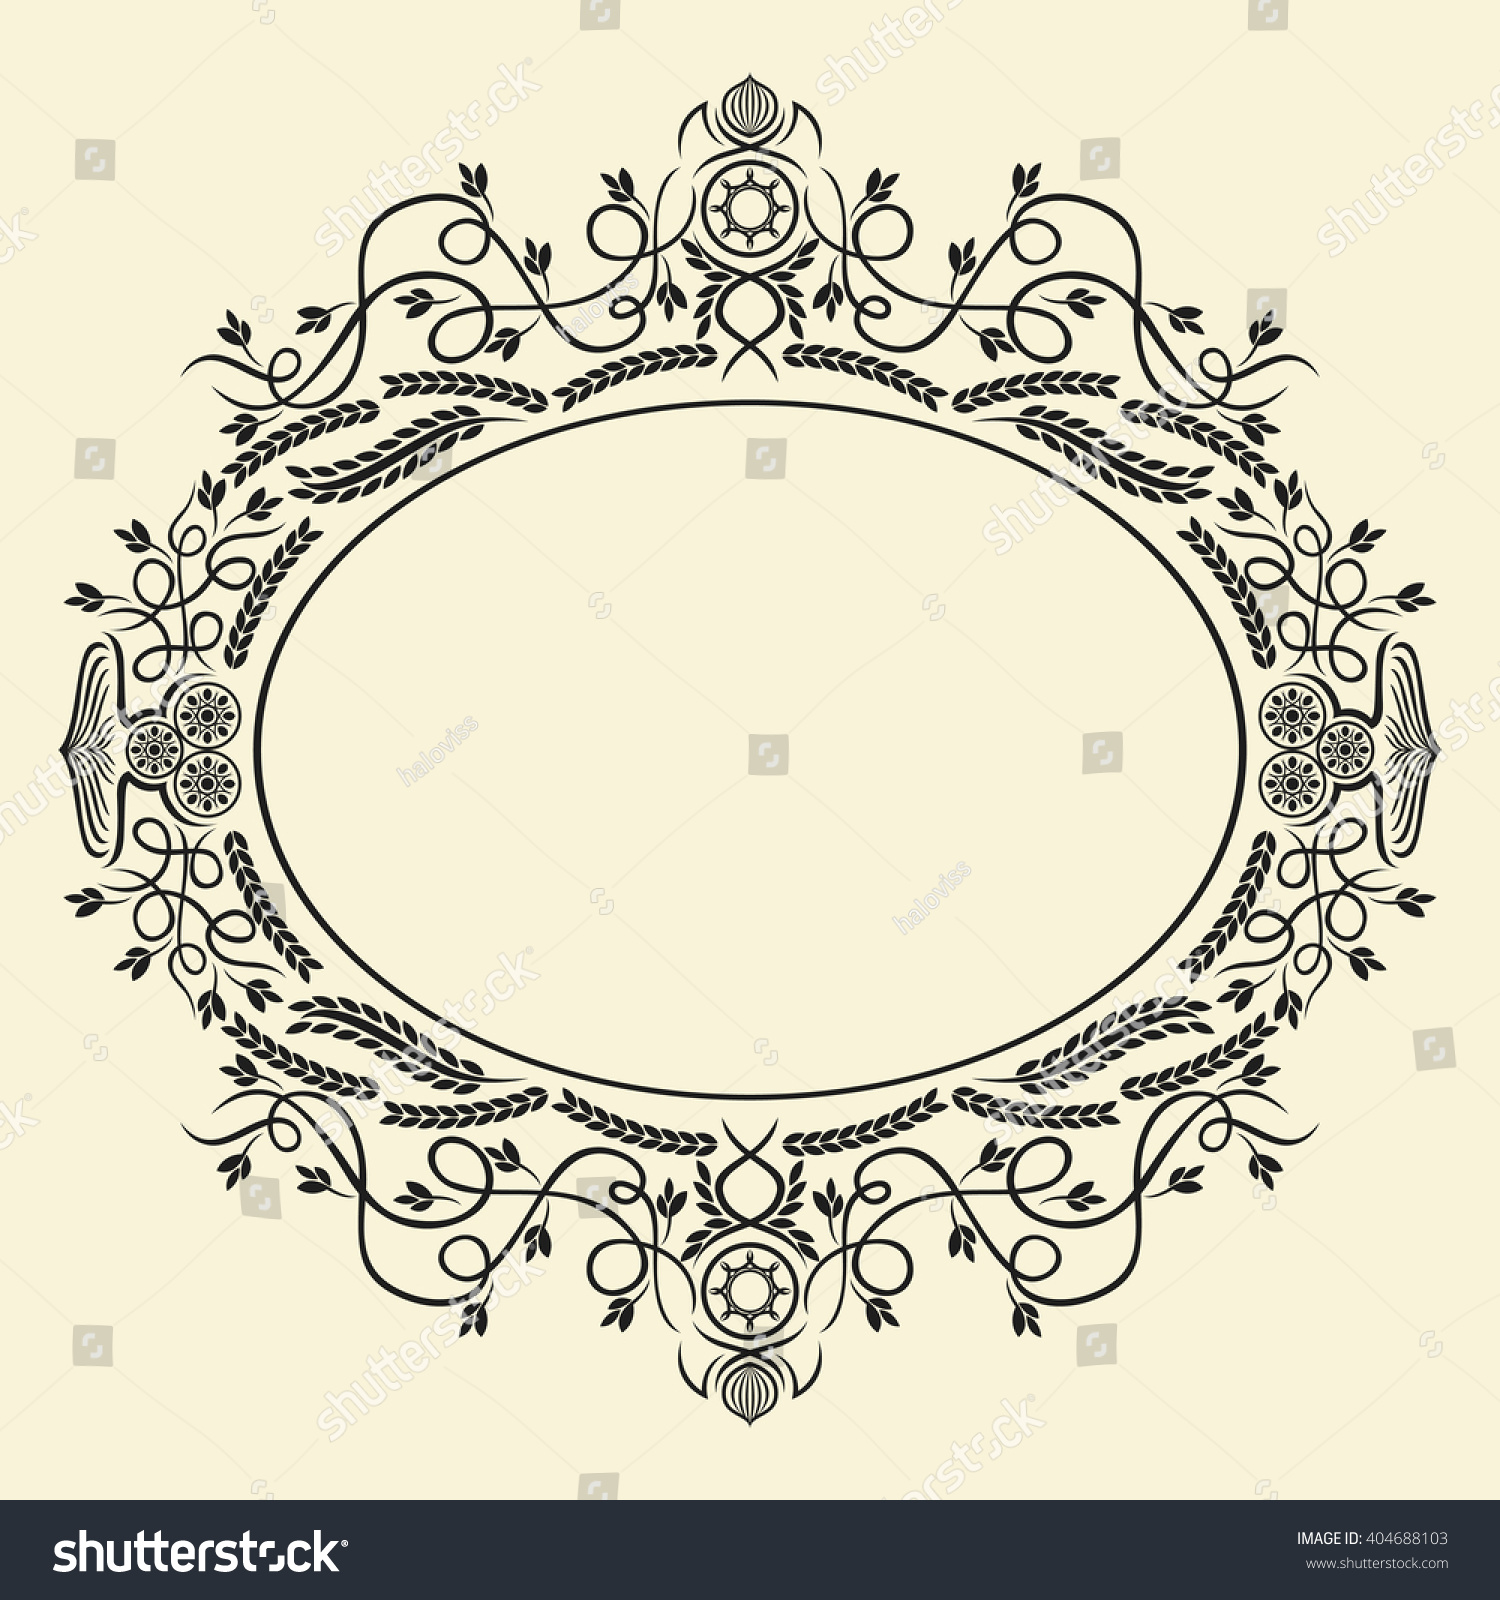 Black Elegant Oval Frame Template Design Stock Photo (Photo, Vector ...